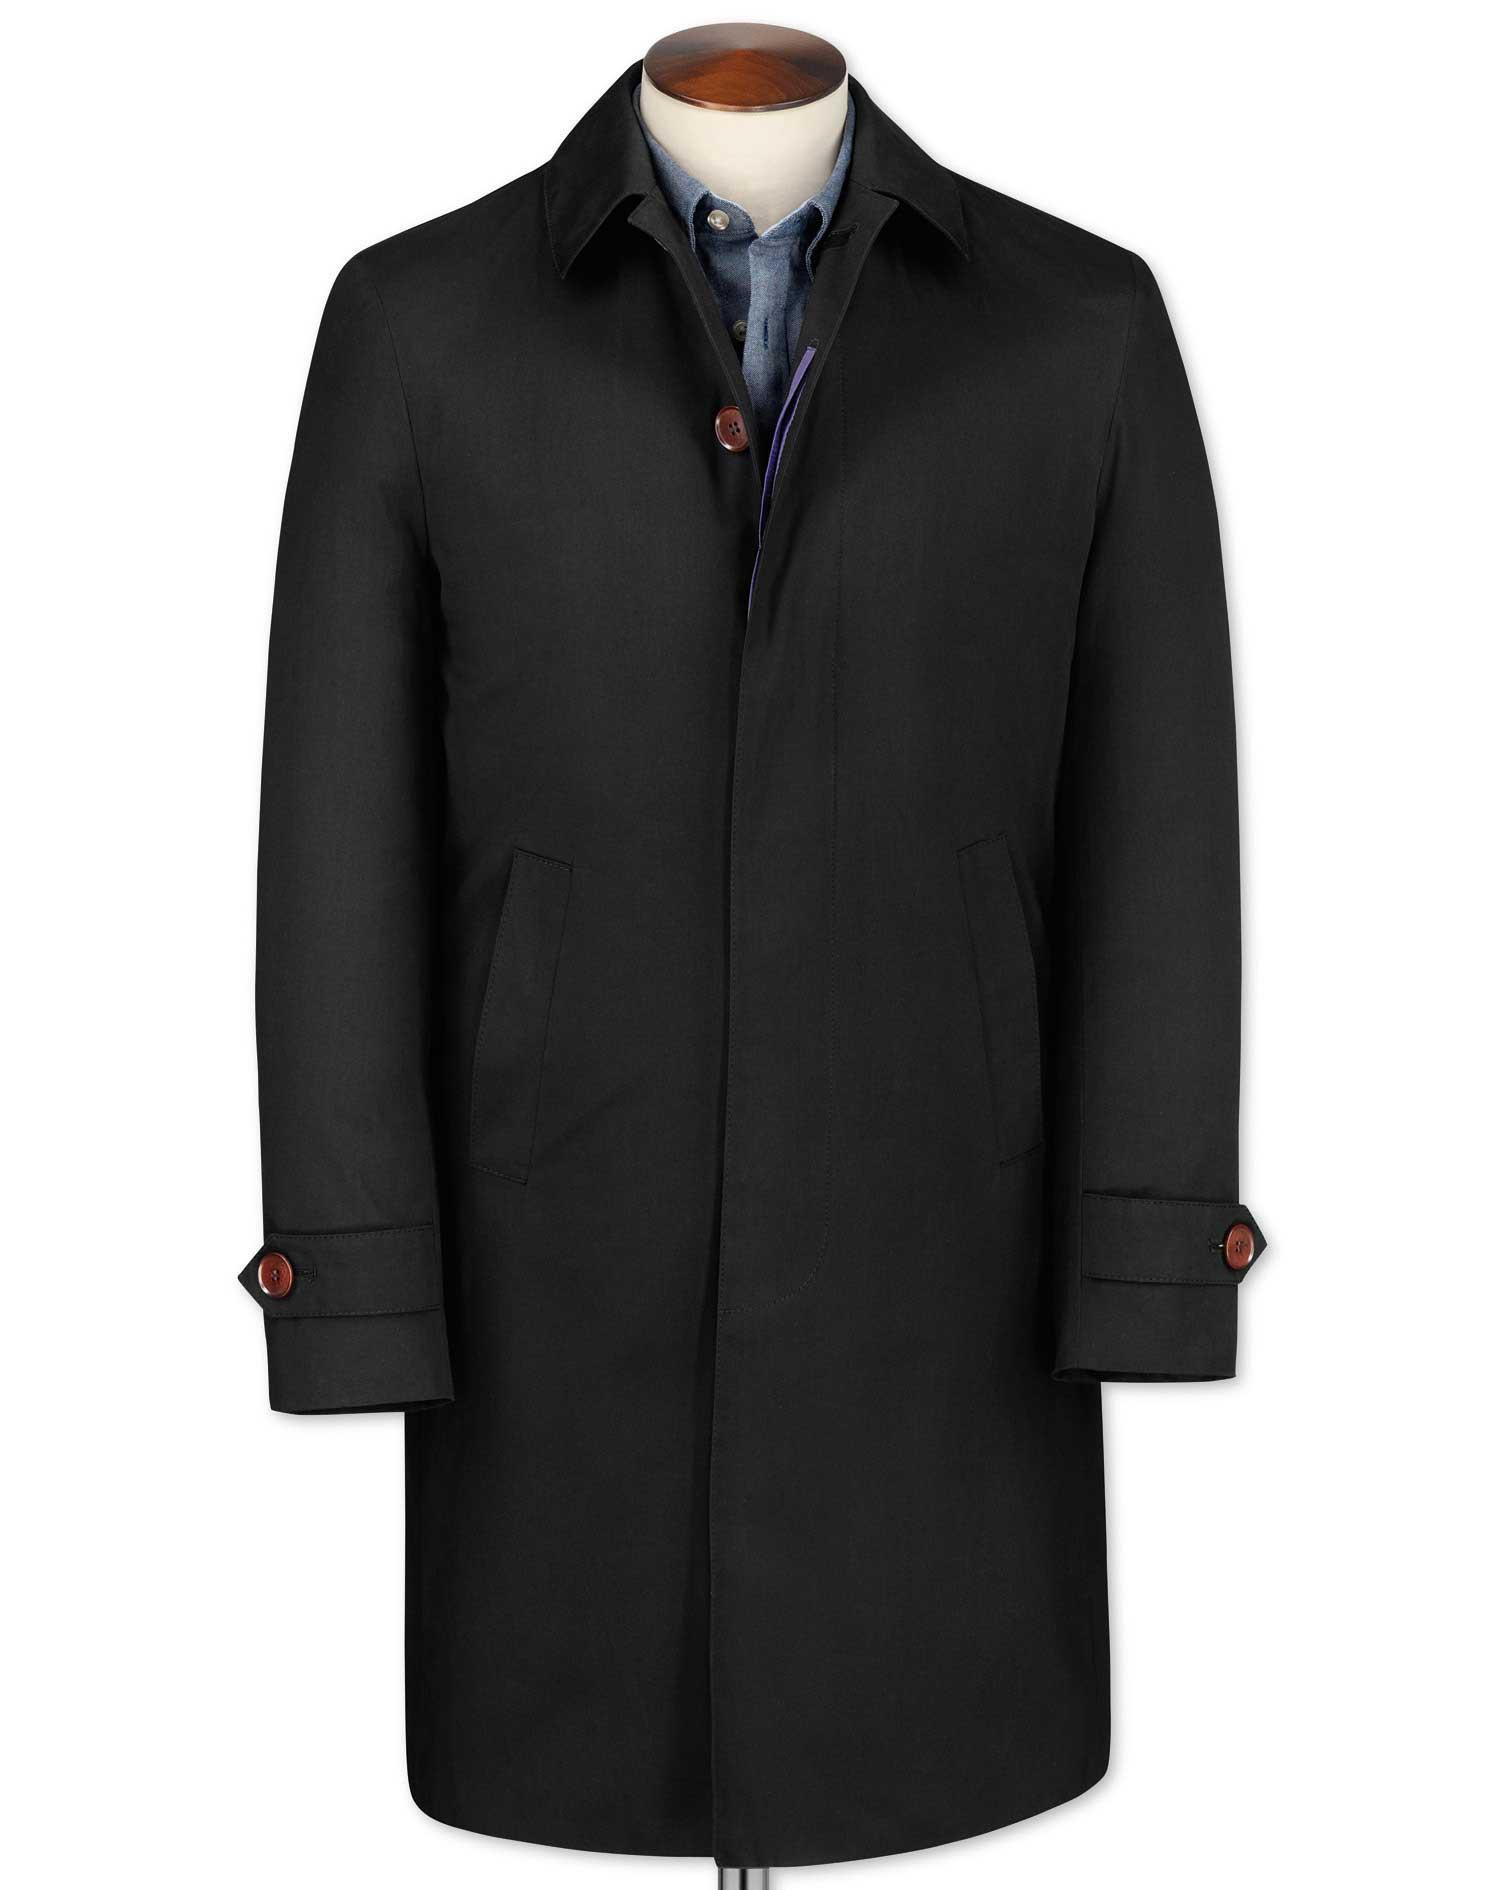 Slim Fit Black RainCotton coat Size 46 Regular by Charles Tyrwhitt